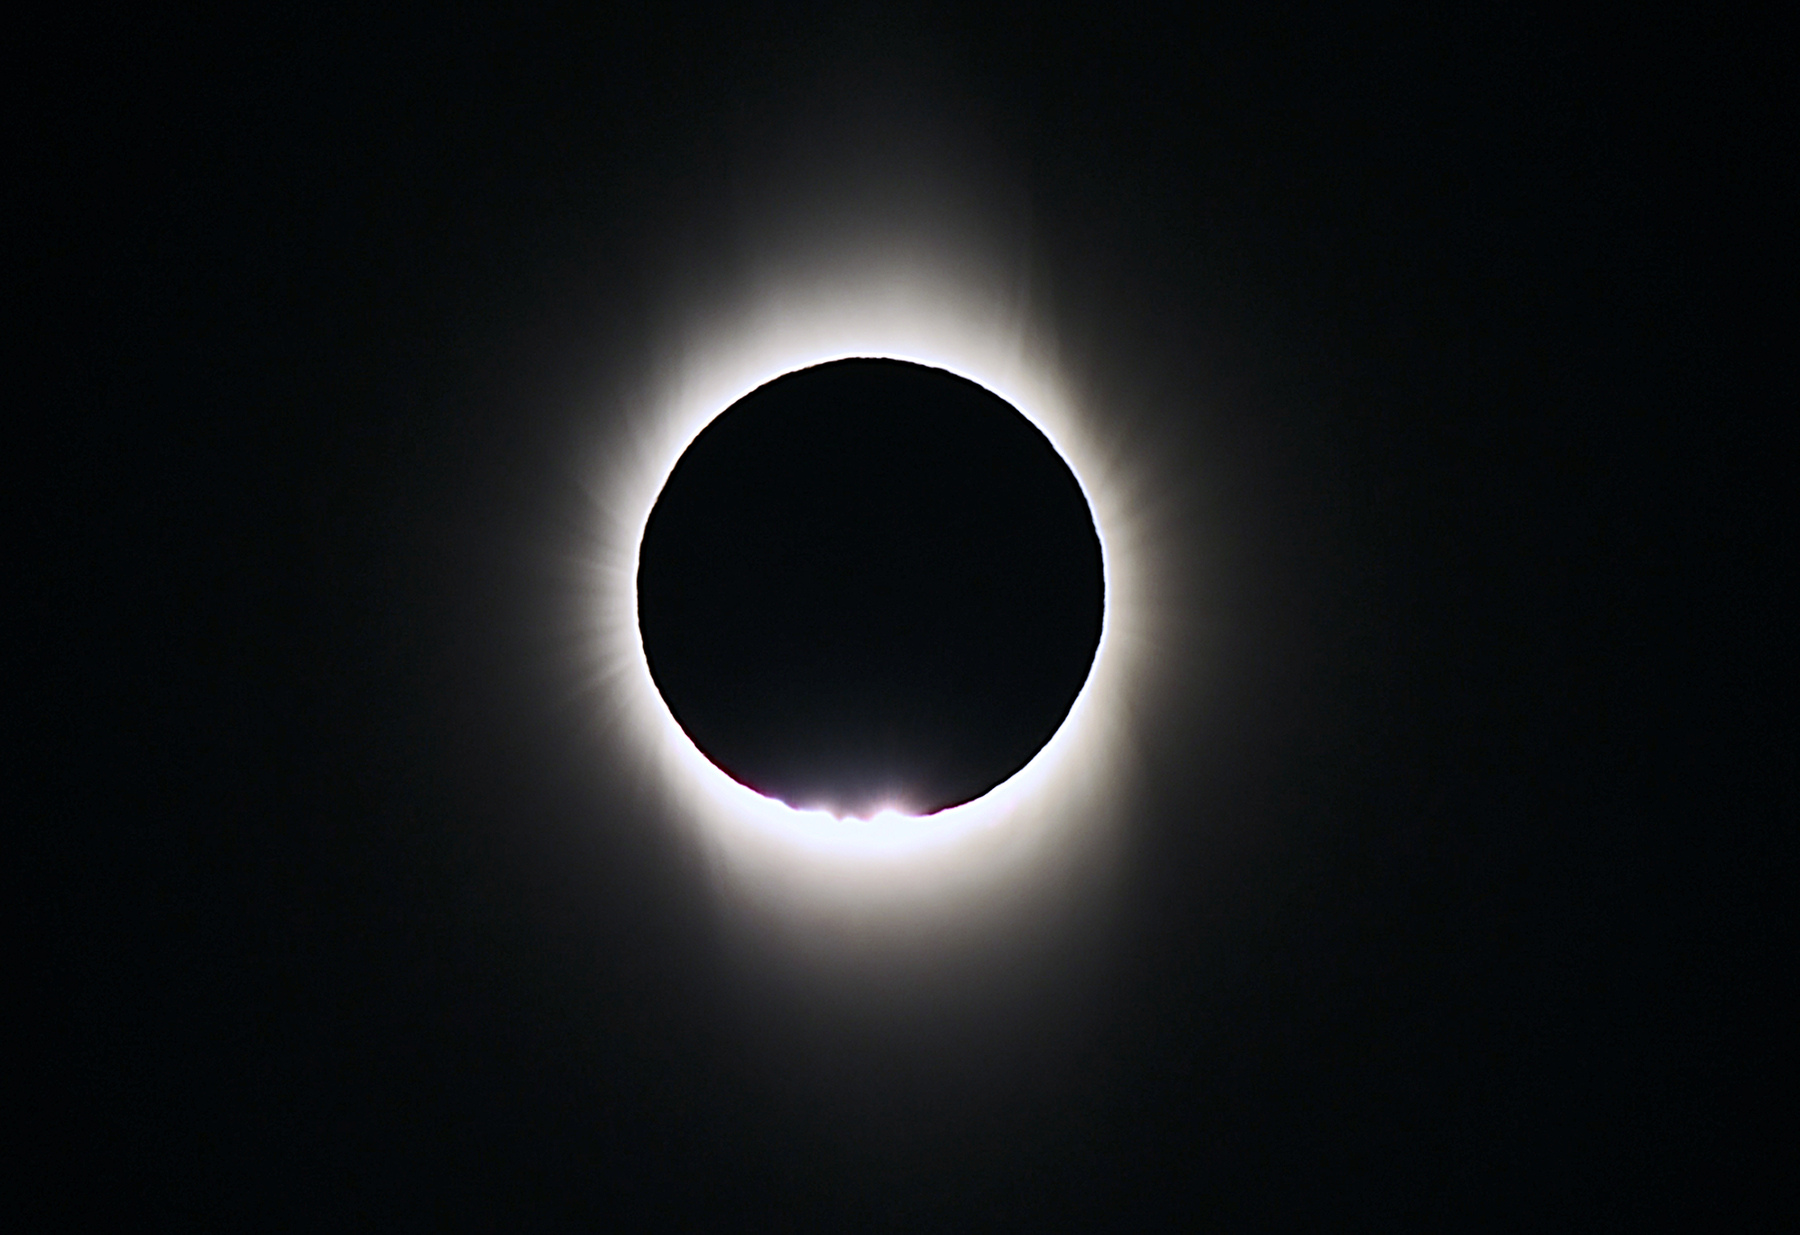 Eclipse tot 02 jul 2019 fb.jpg